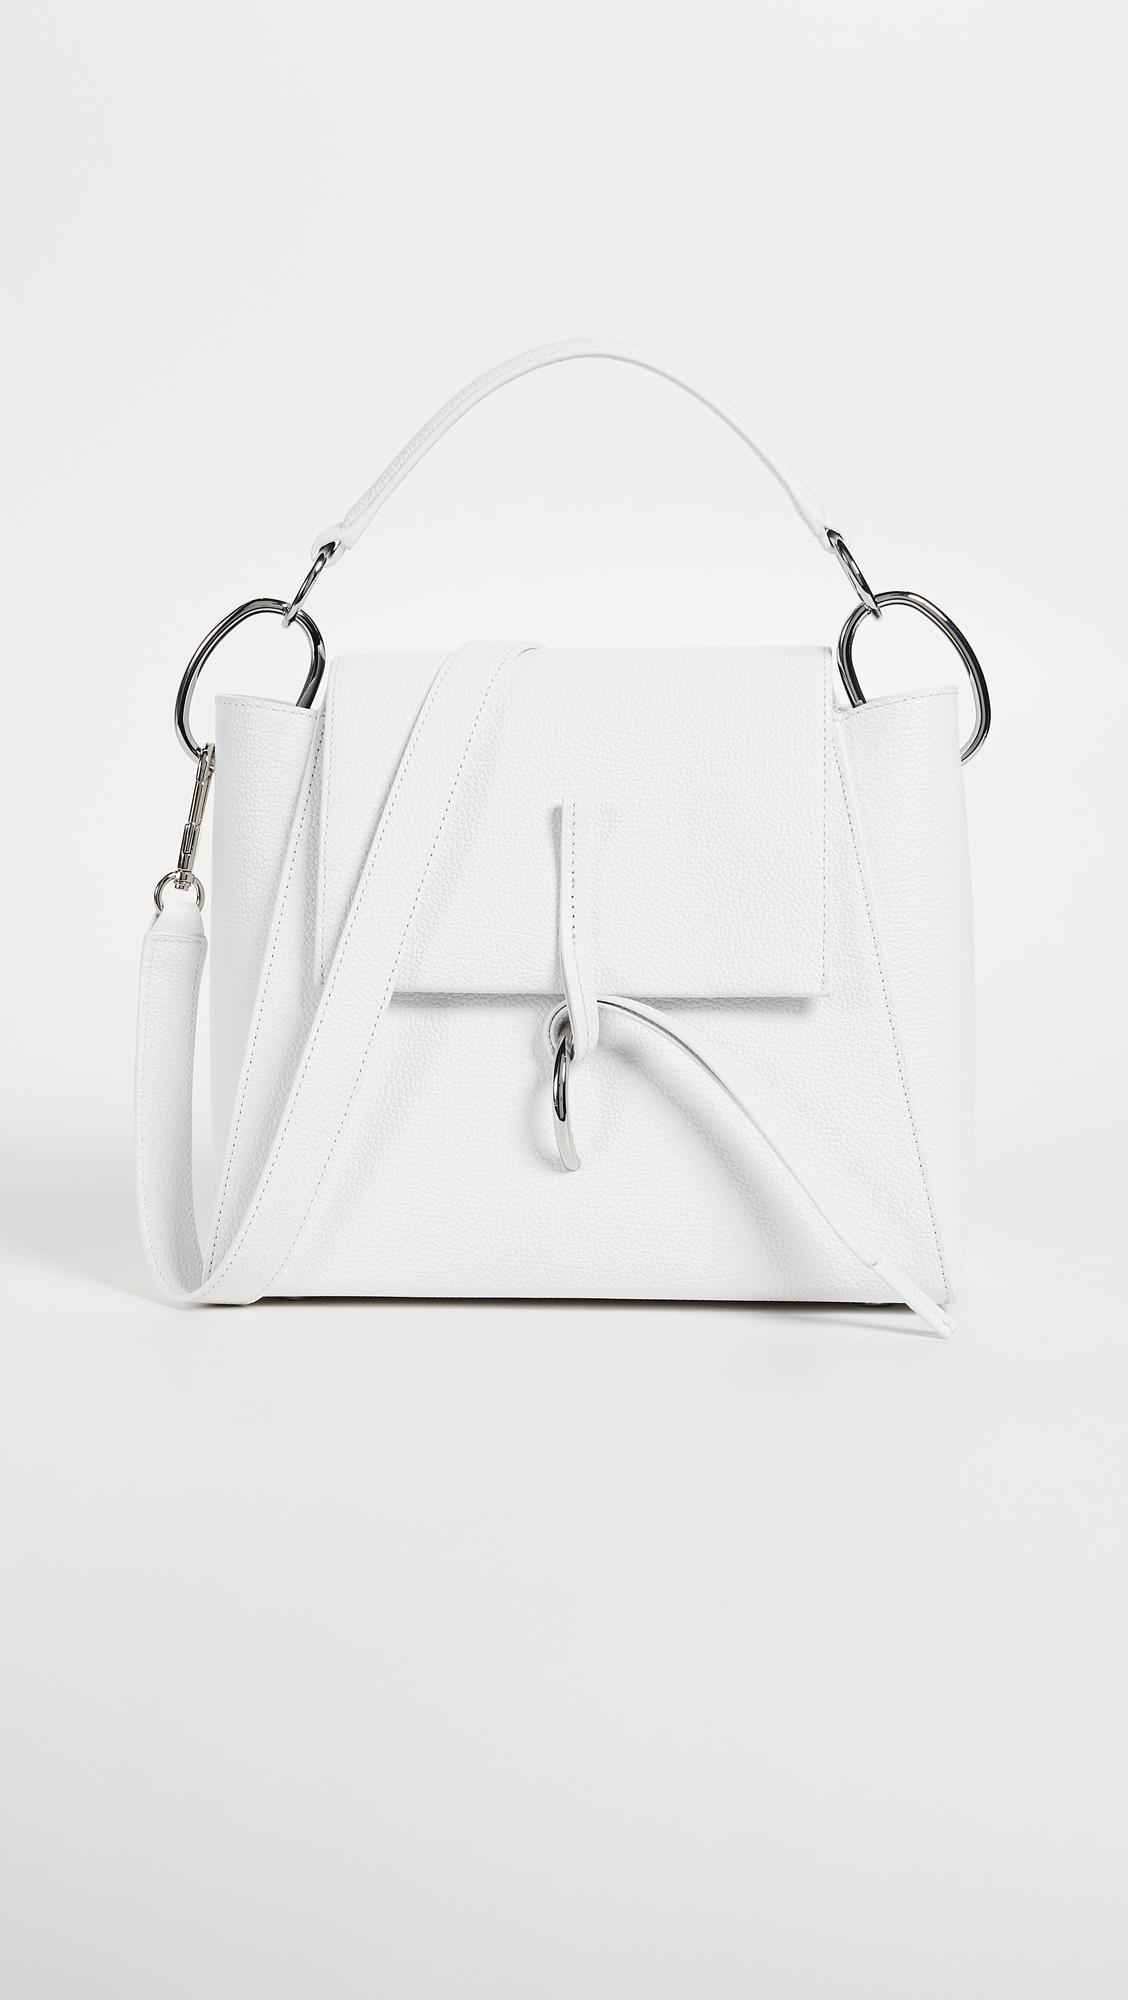 White Leigh Top Handle Bag 3.1 Phillip Lim okUBvjkX